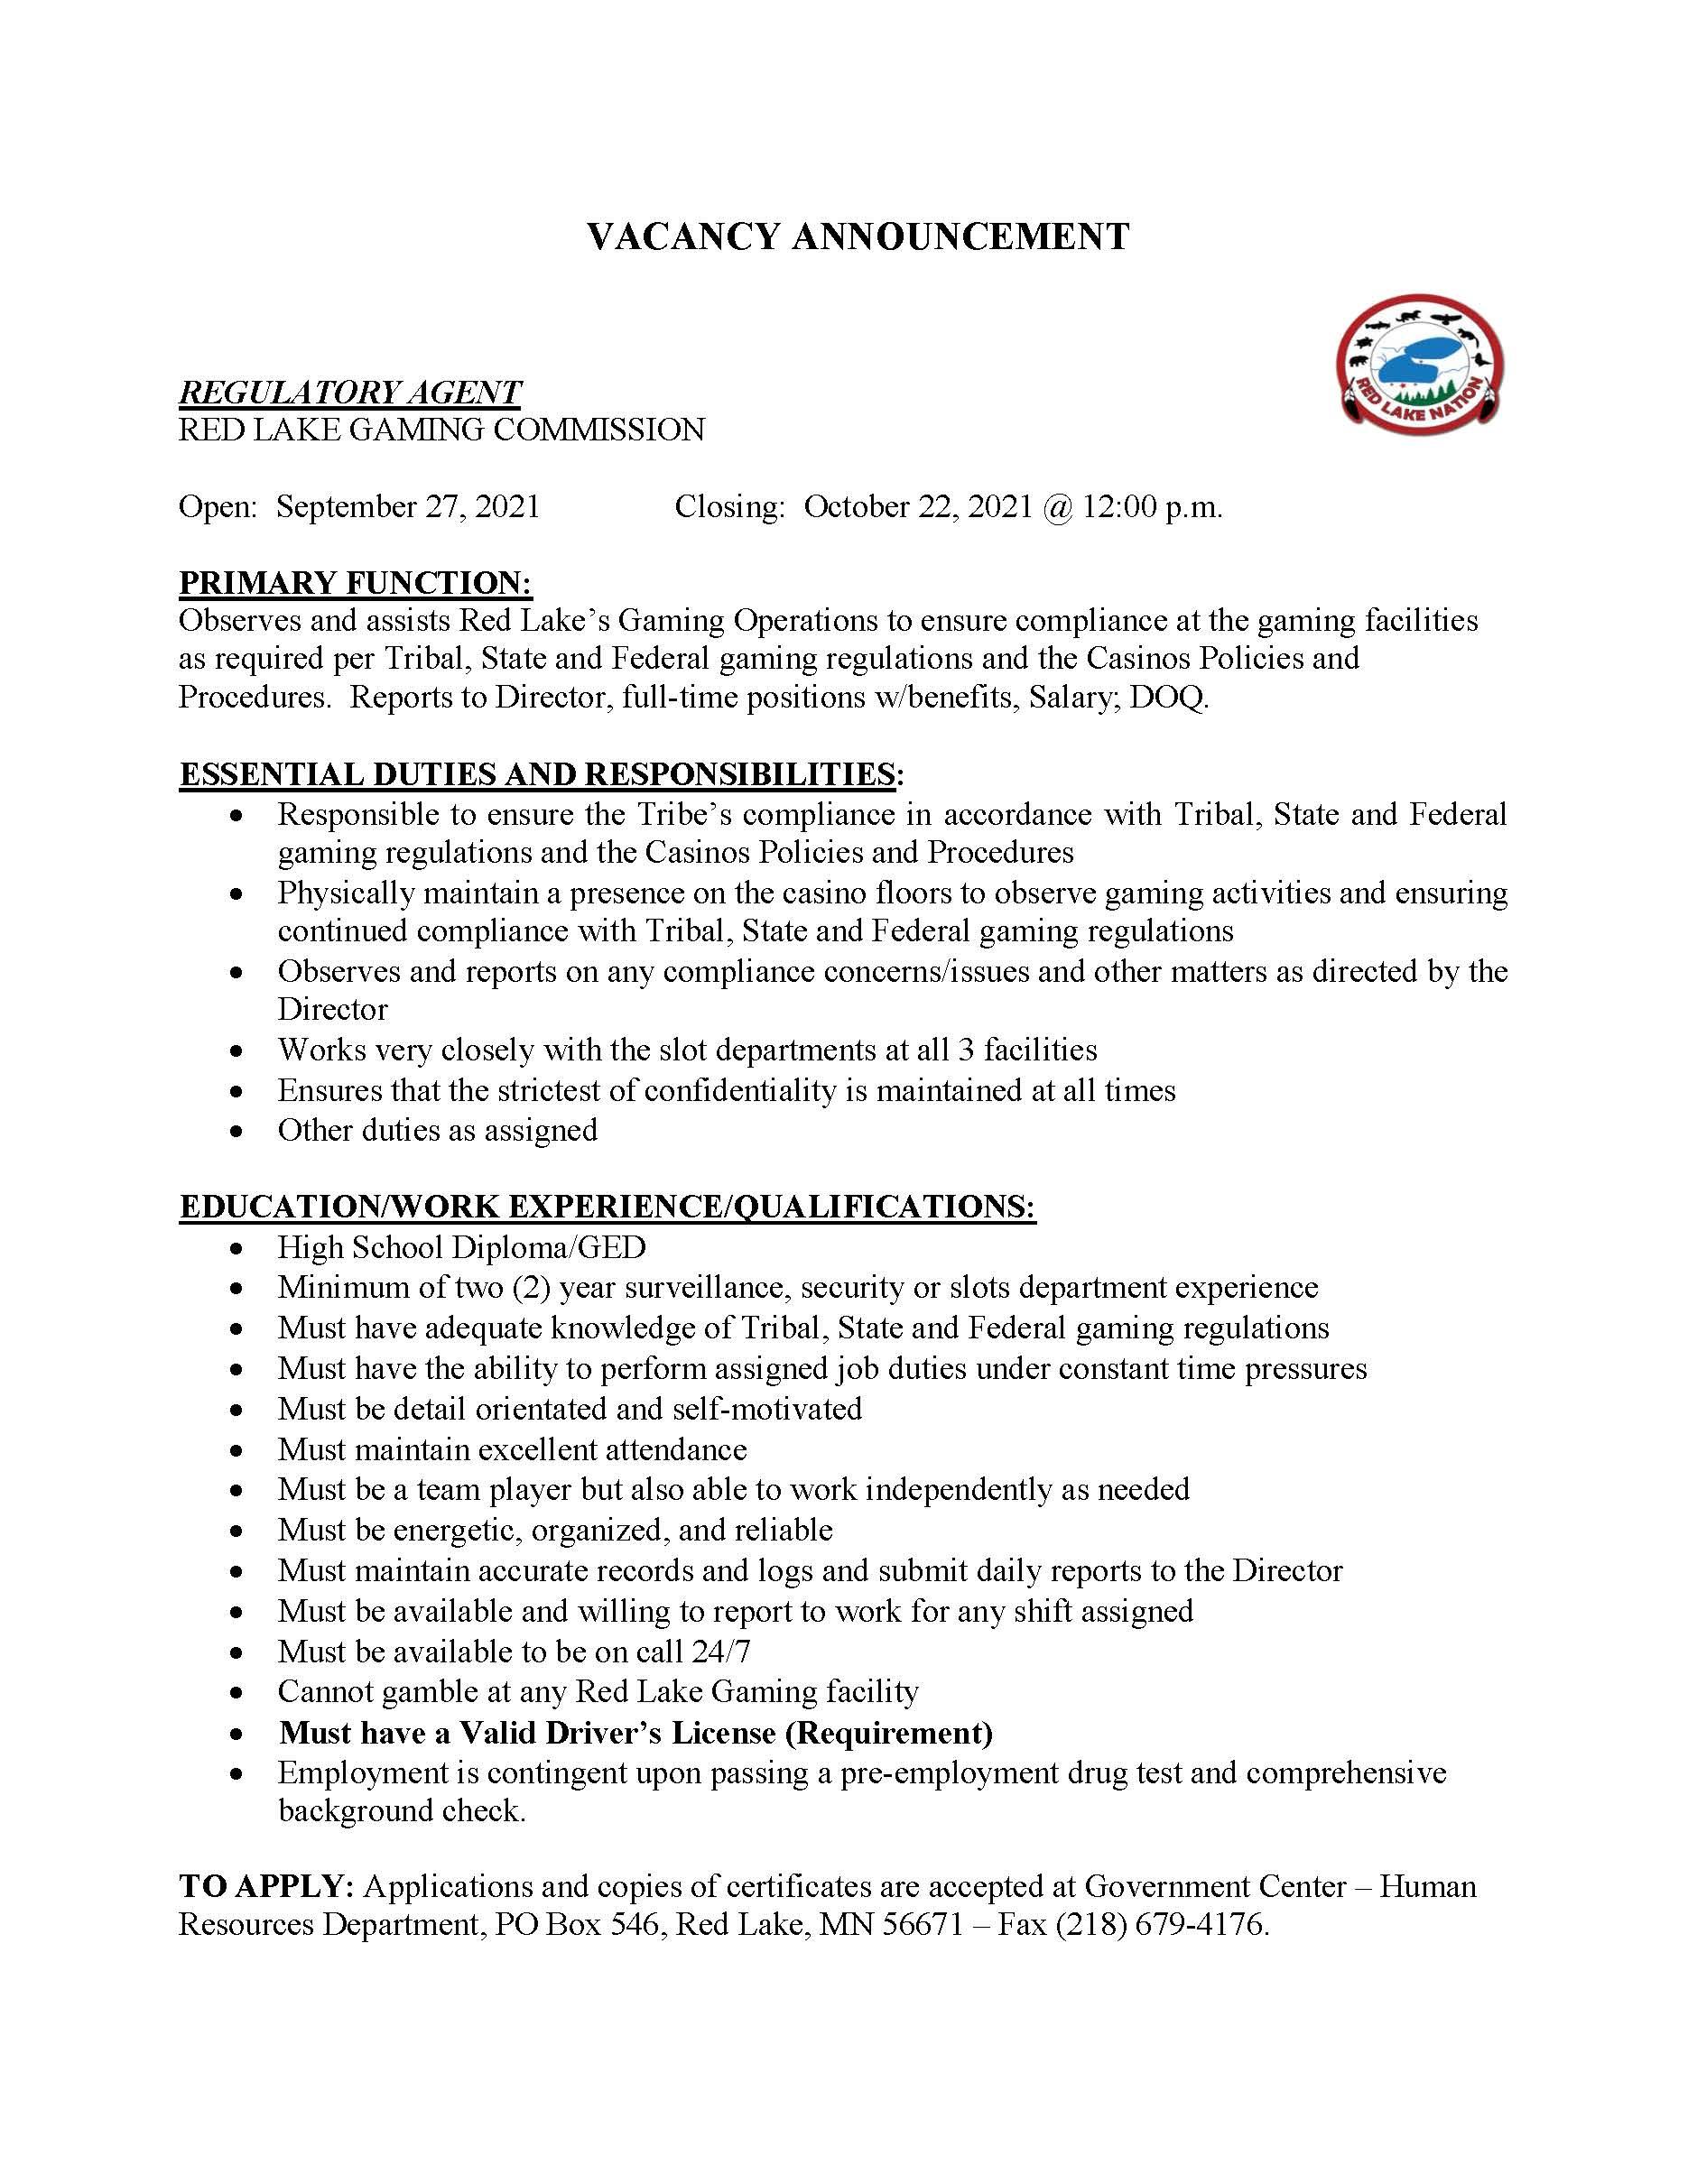 Regulatory Agent-Gaming Commission-Job Posting-9-28-2021